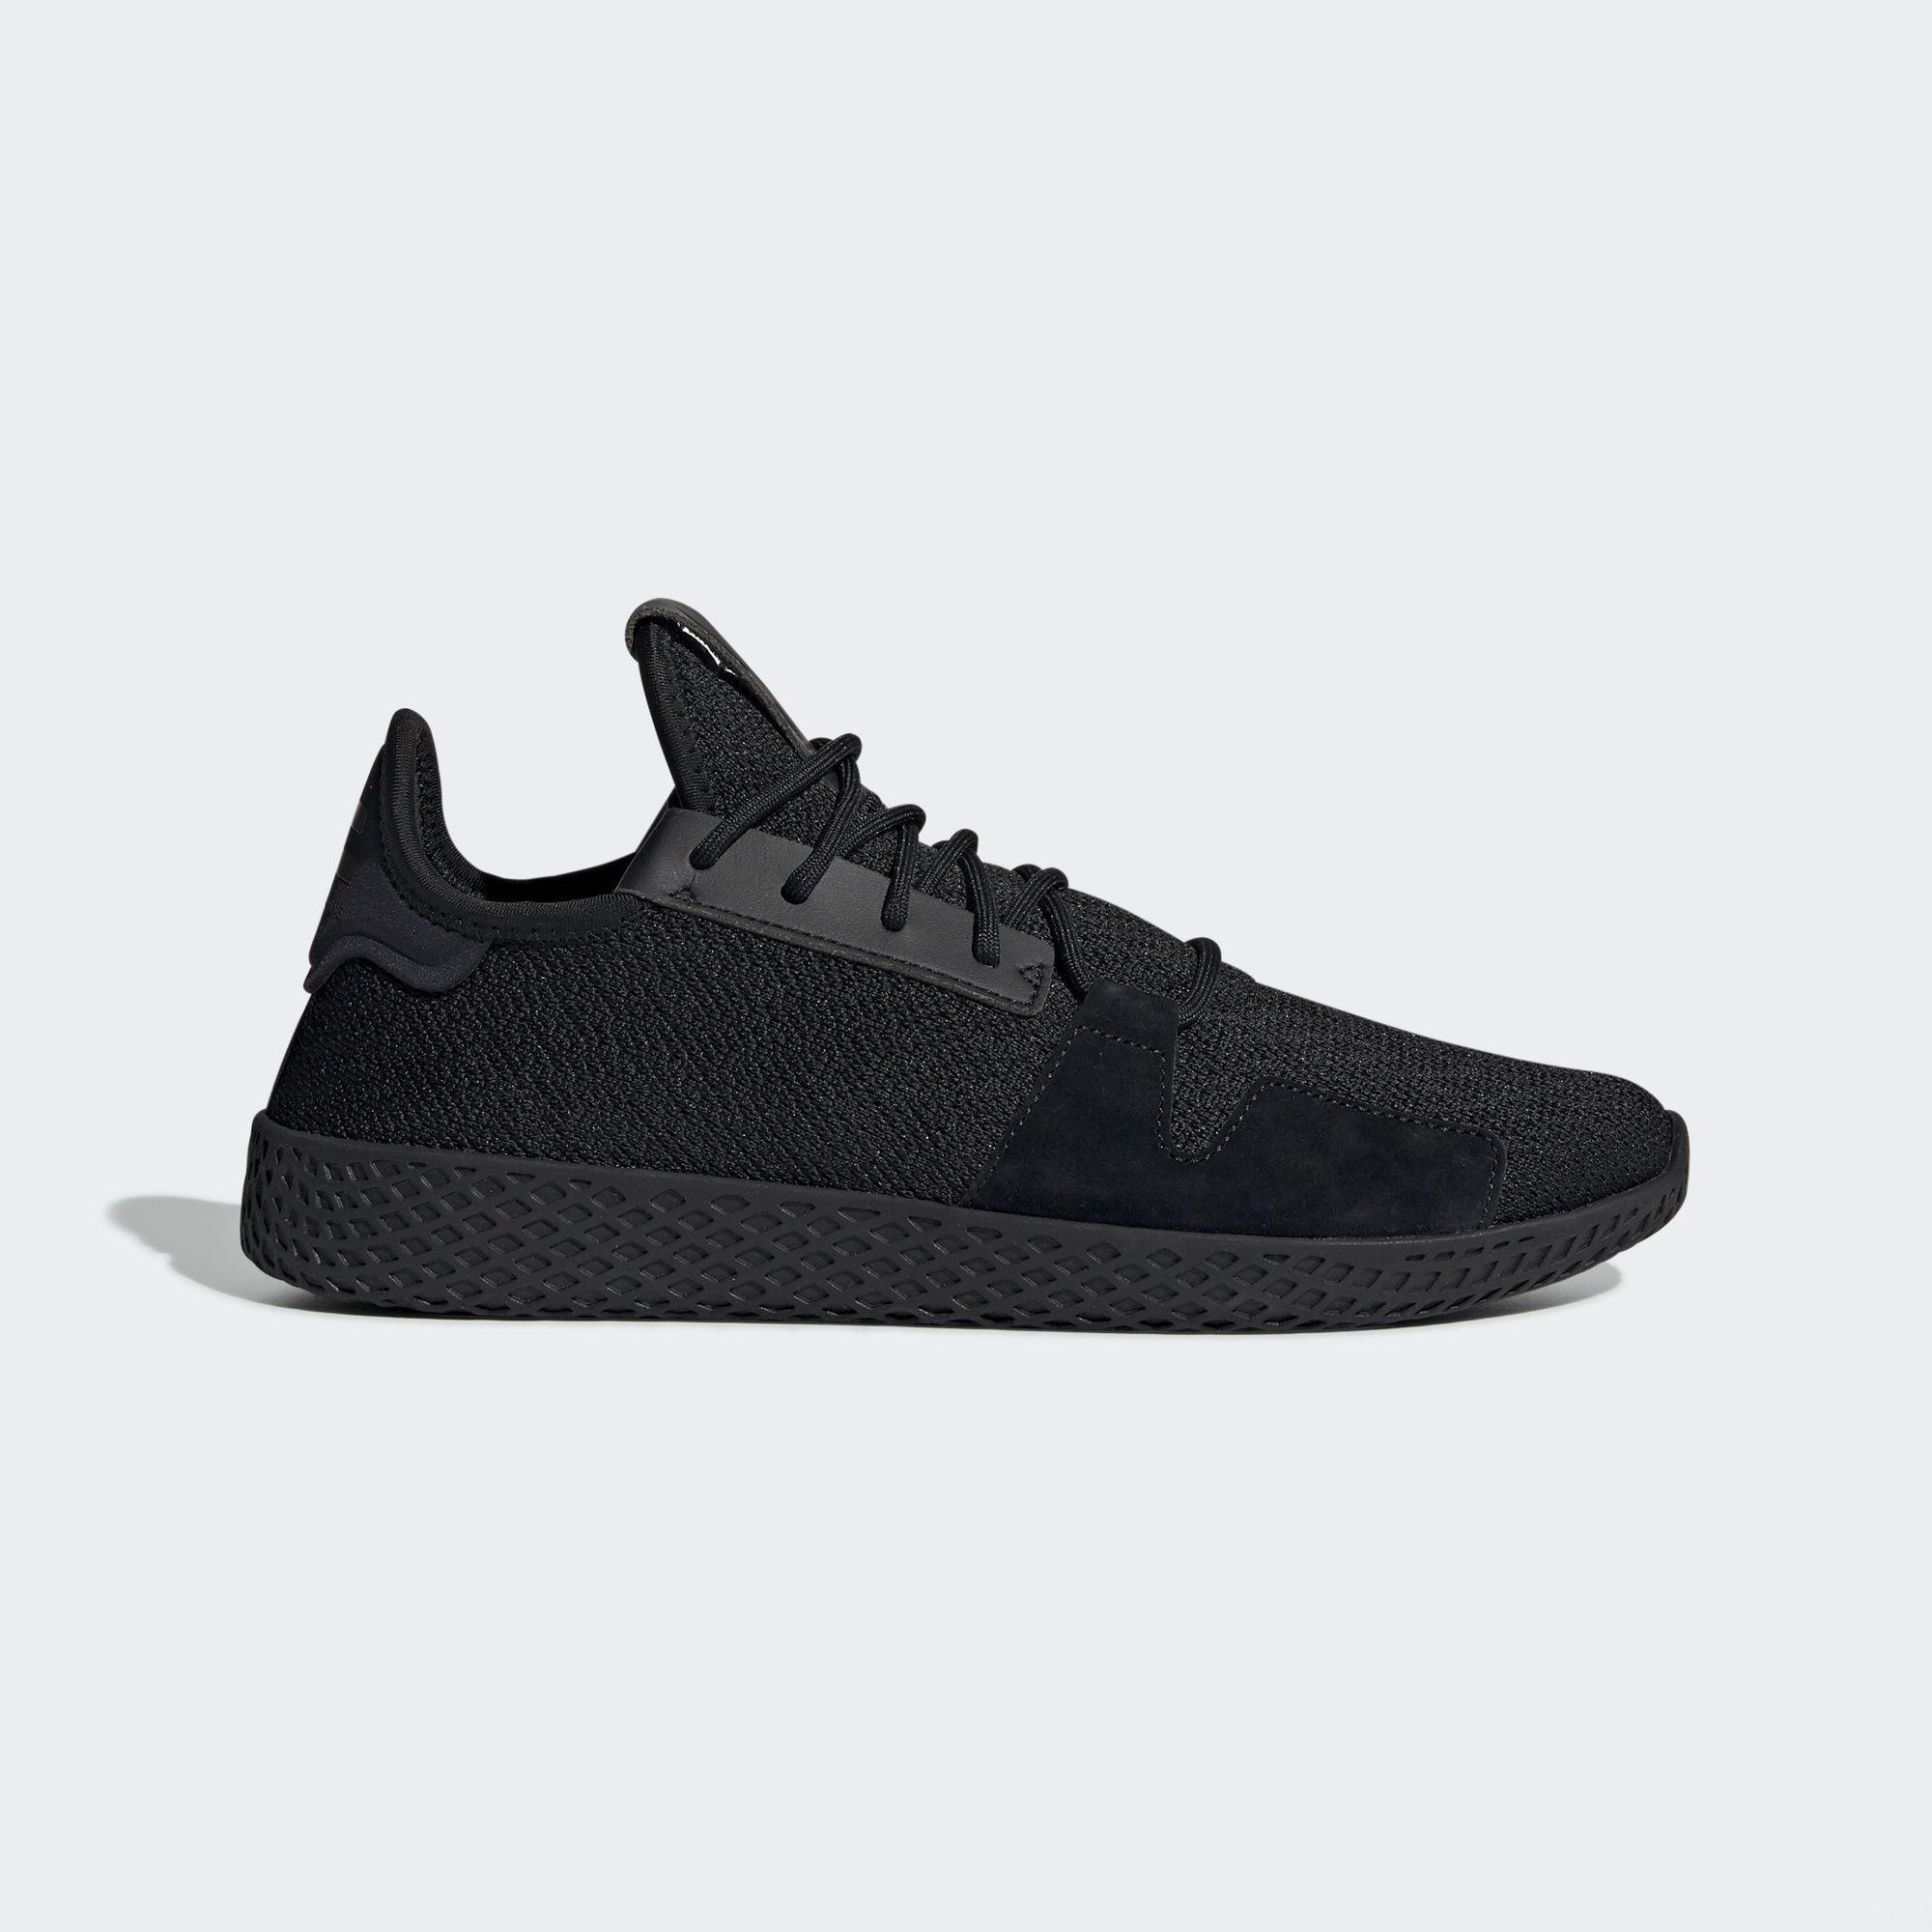 f7caac0bd adidas Originals Pharrell Williams Tennis Hu V2 Shoes in Black for ...